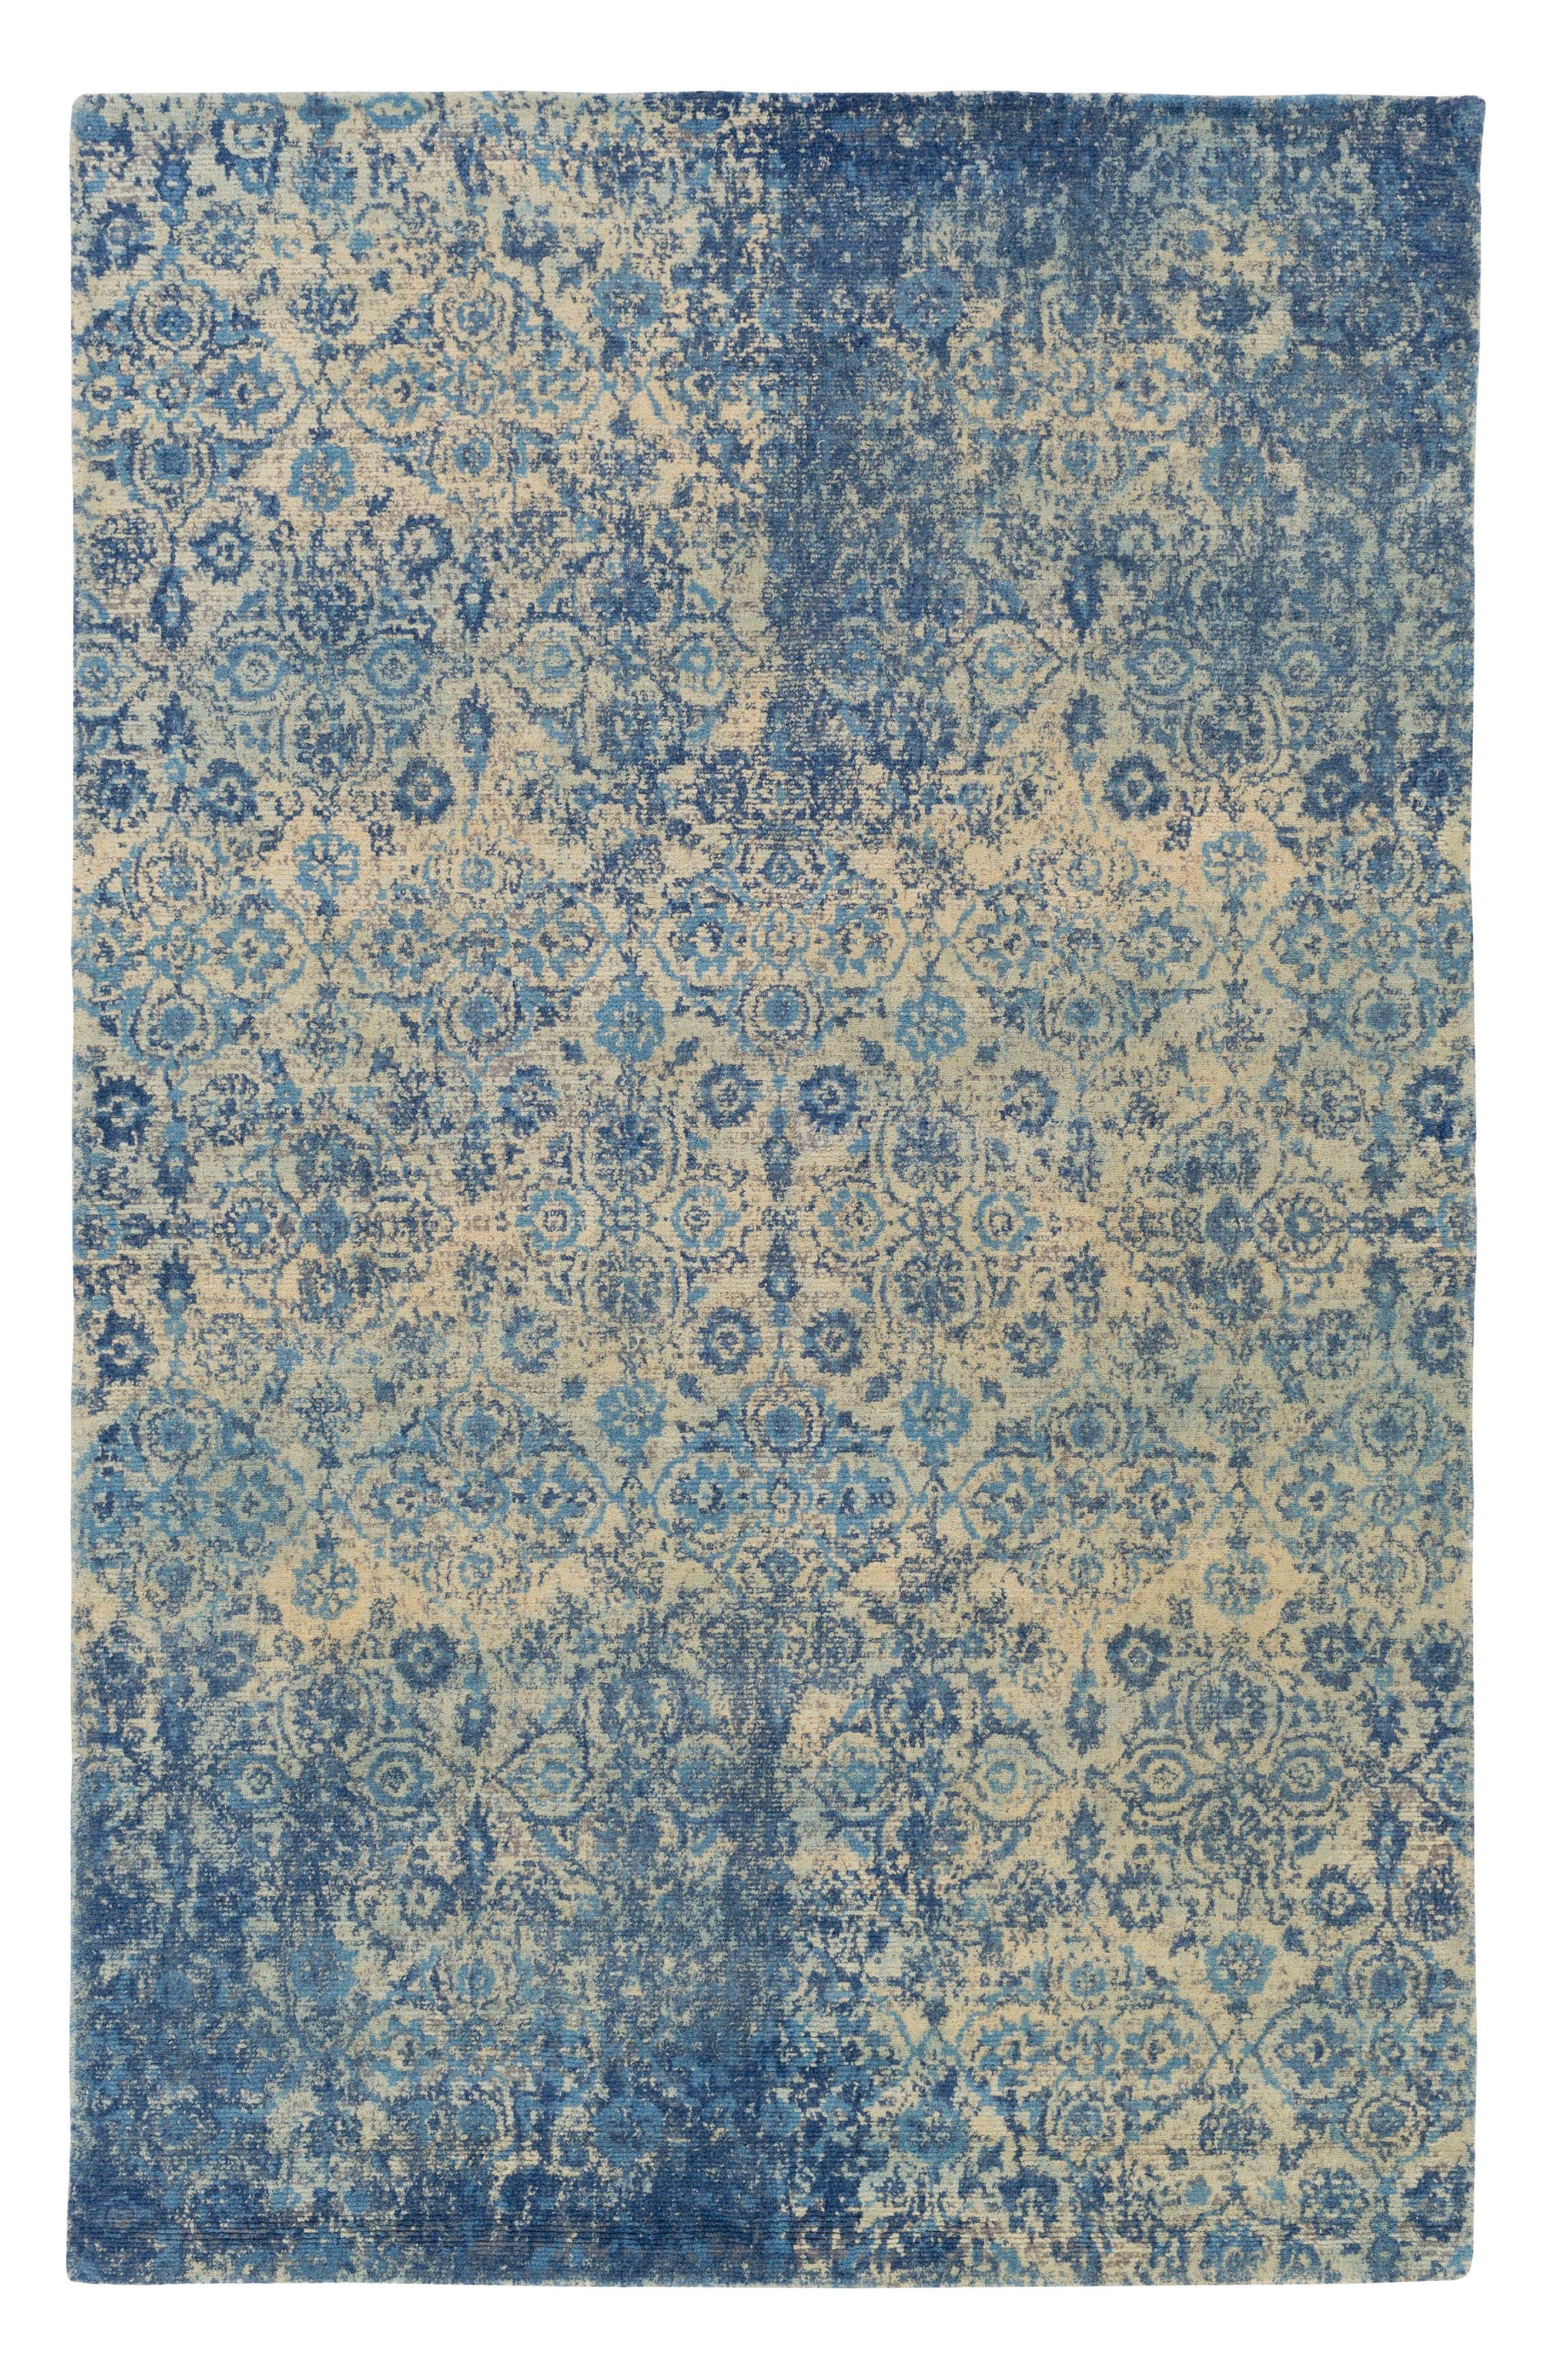 Alternate Image 1 Selected - Surya Home Tuscany Wool Rug